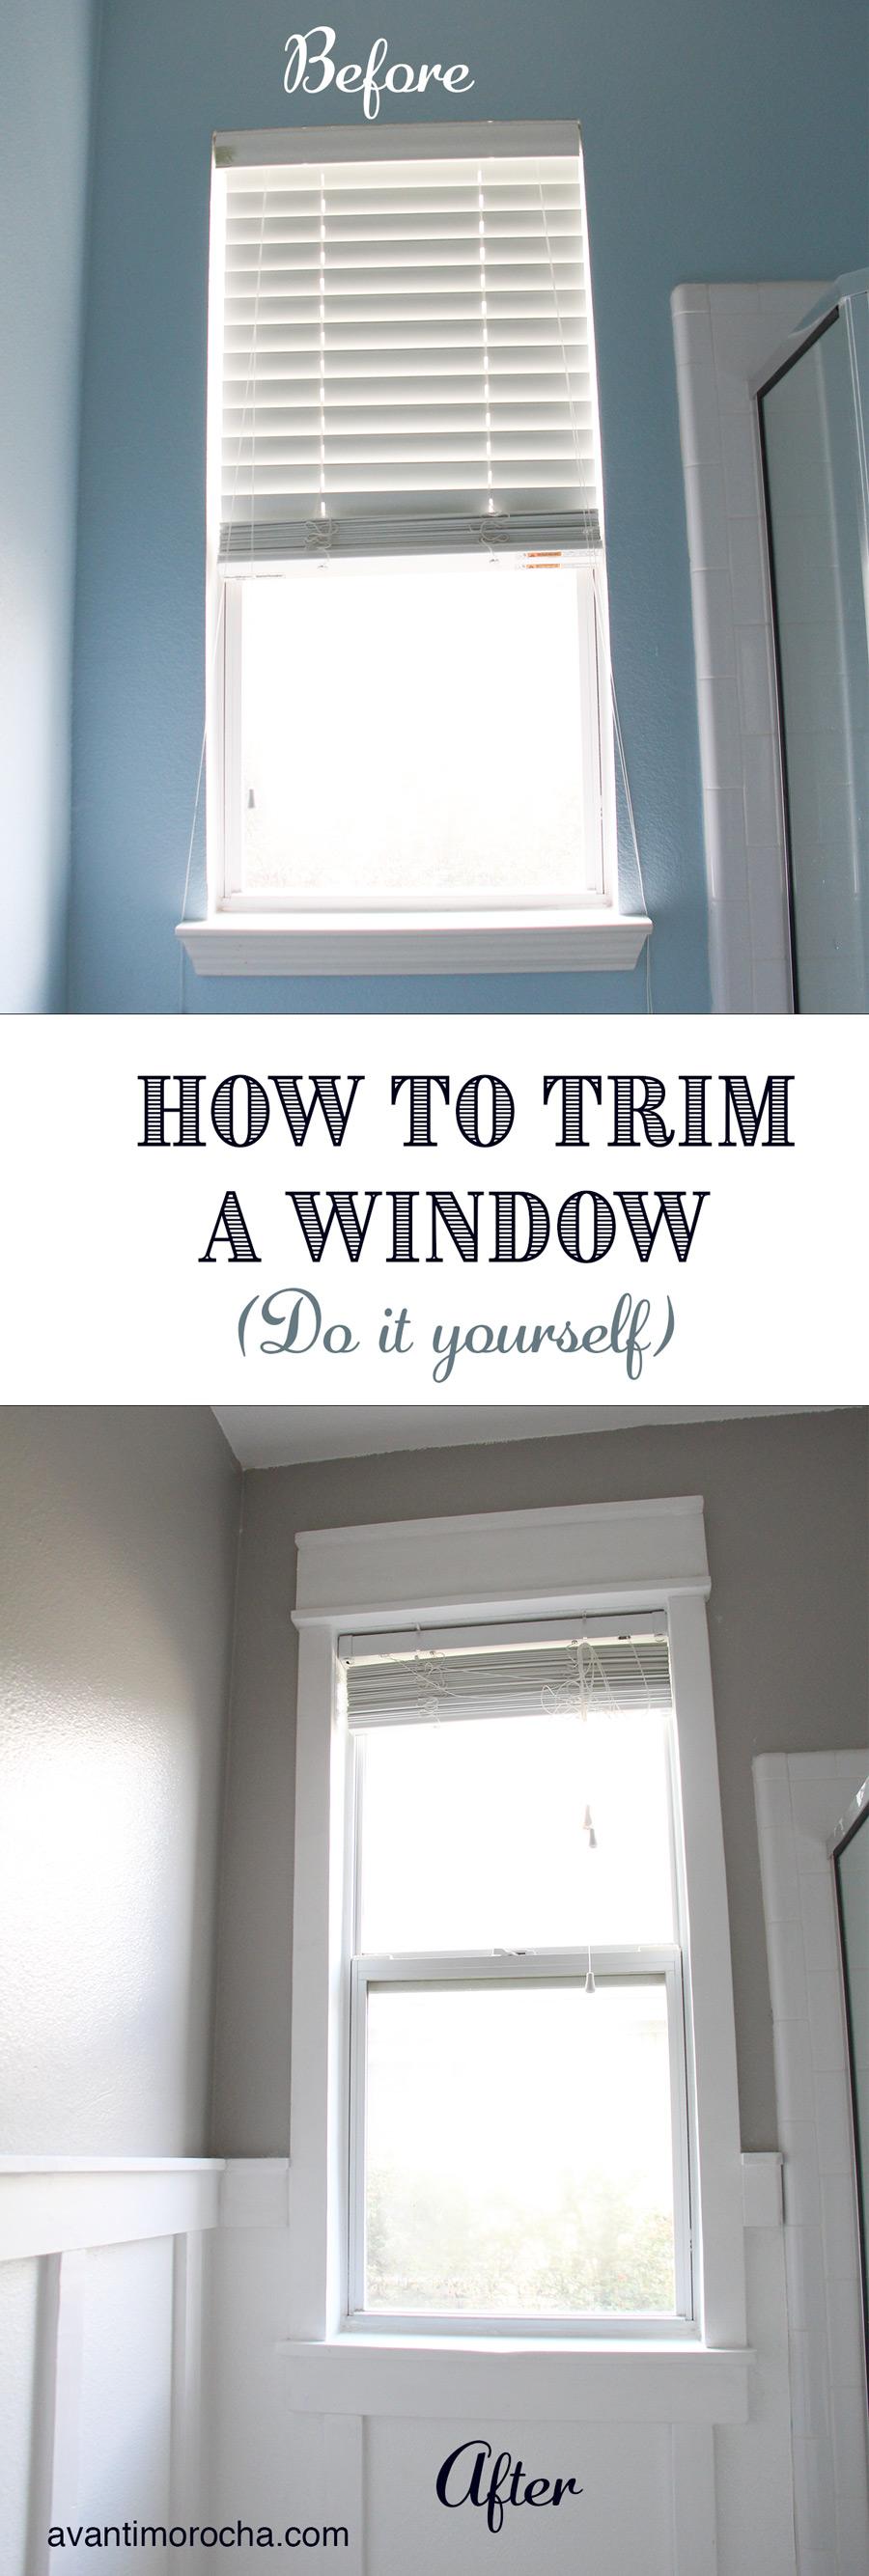 DIY window trim